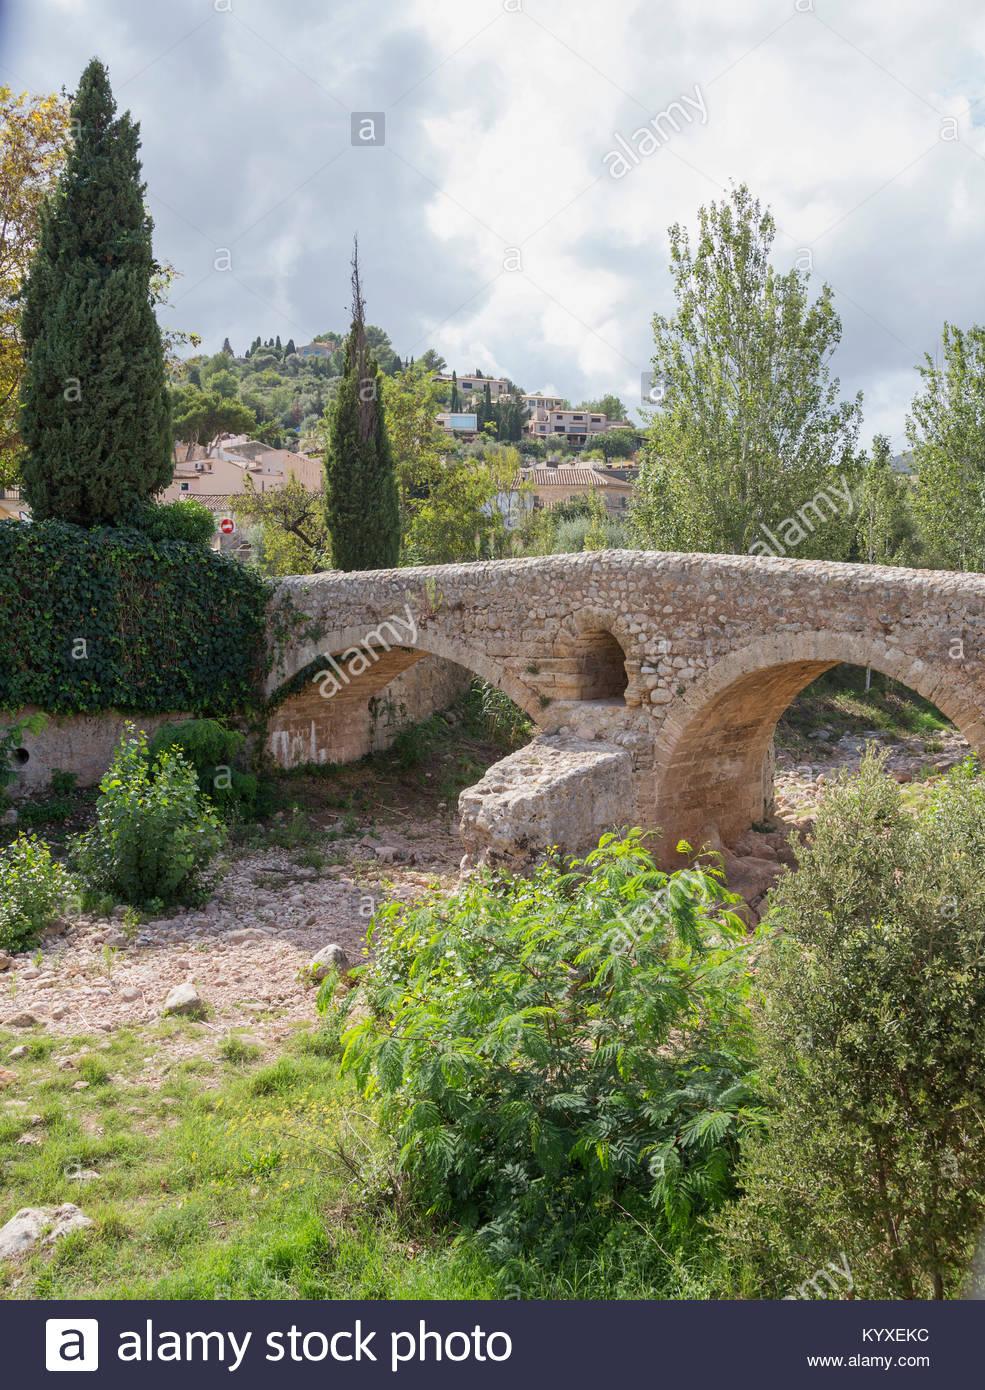 Old Roman double arch stone bridge, Pollenca, Mallorca, Balearic Islands, Spain, Europe Stock Photo